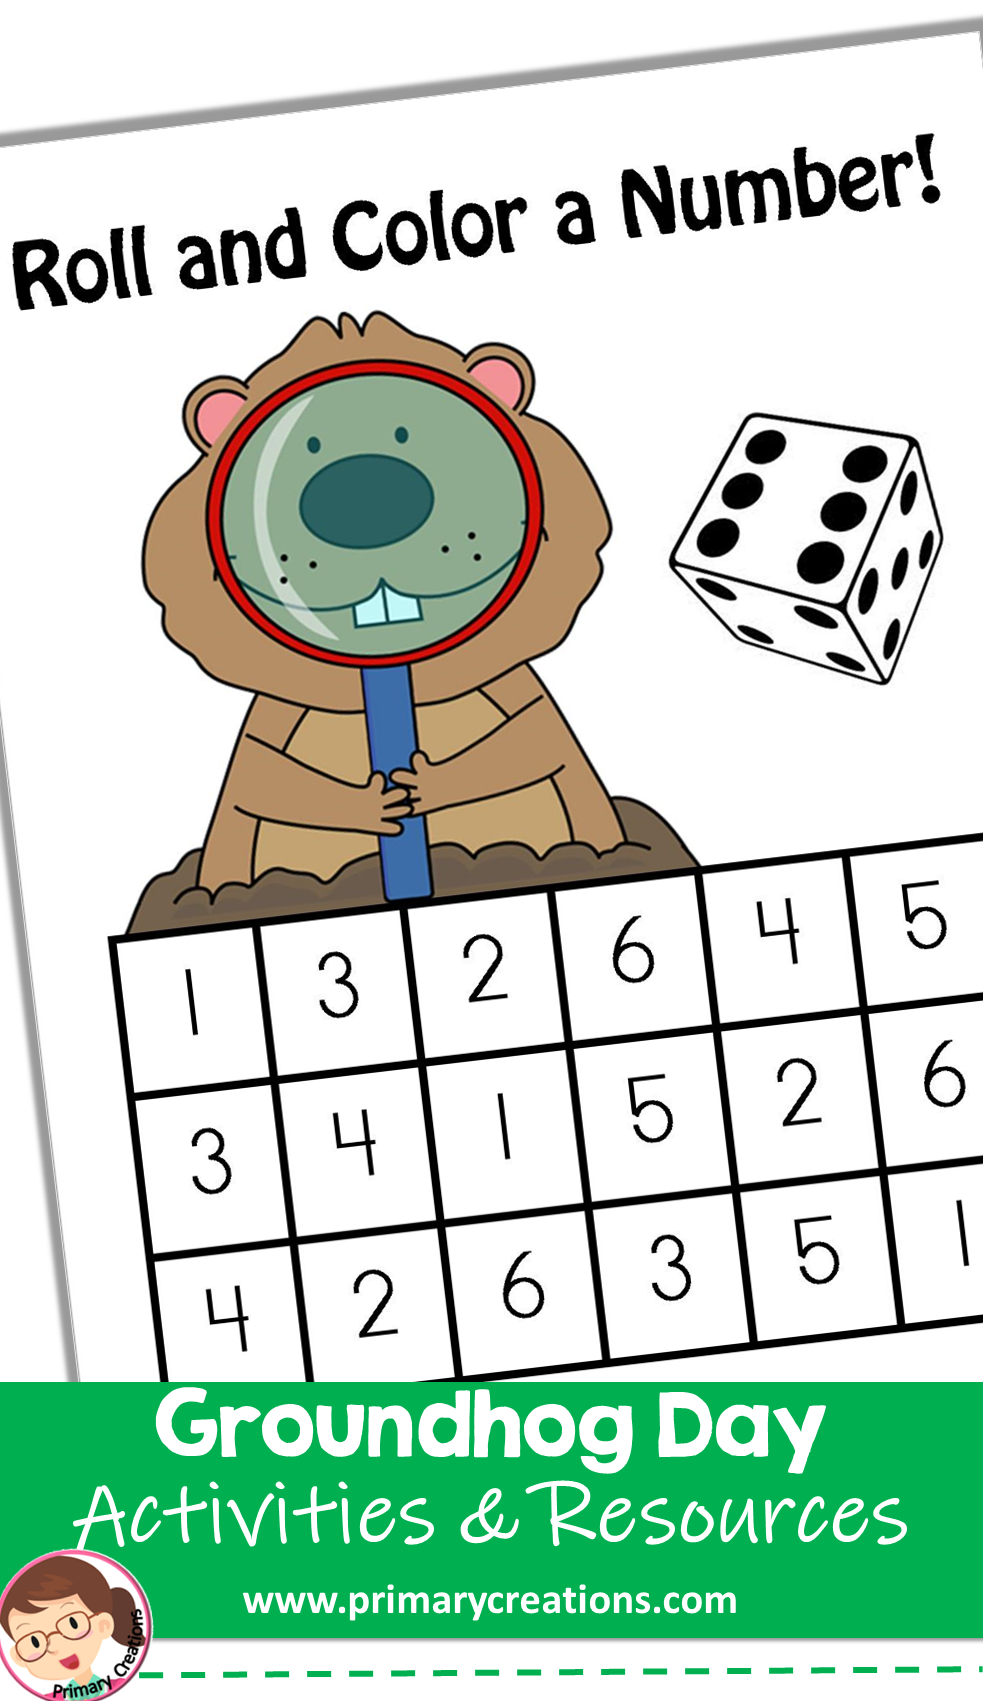 Groundhog Day Activities For Preschool Math Groundhog Day Activities Math Activities Preschool Preschool Math [ 1701 x 983 Pixel ]